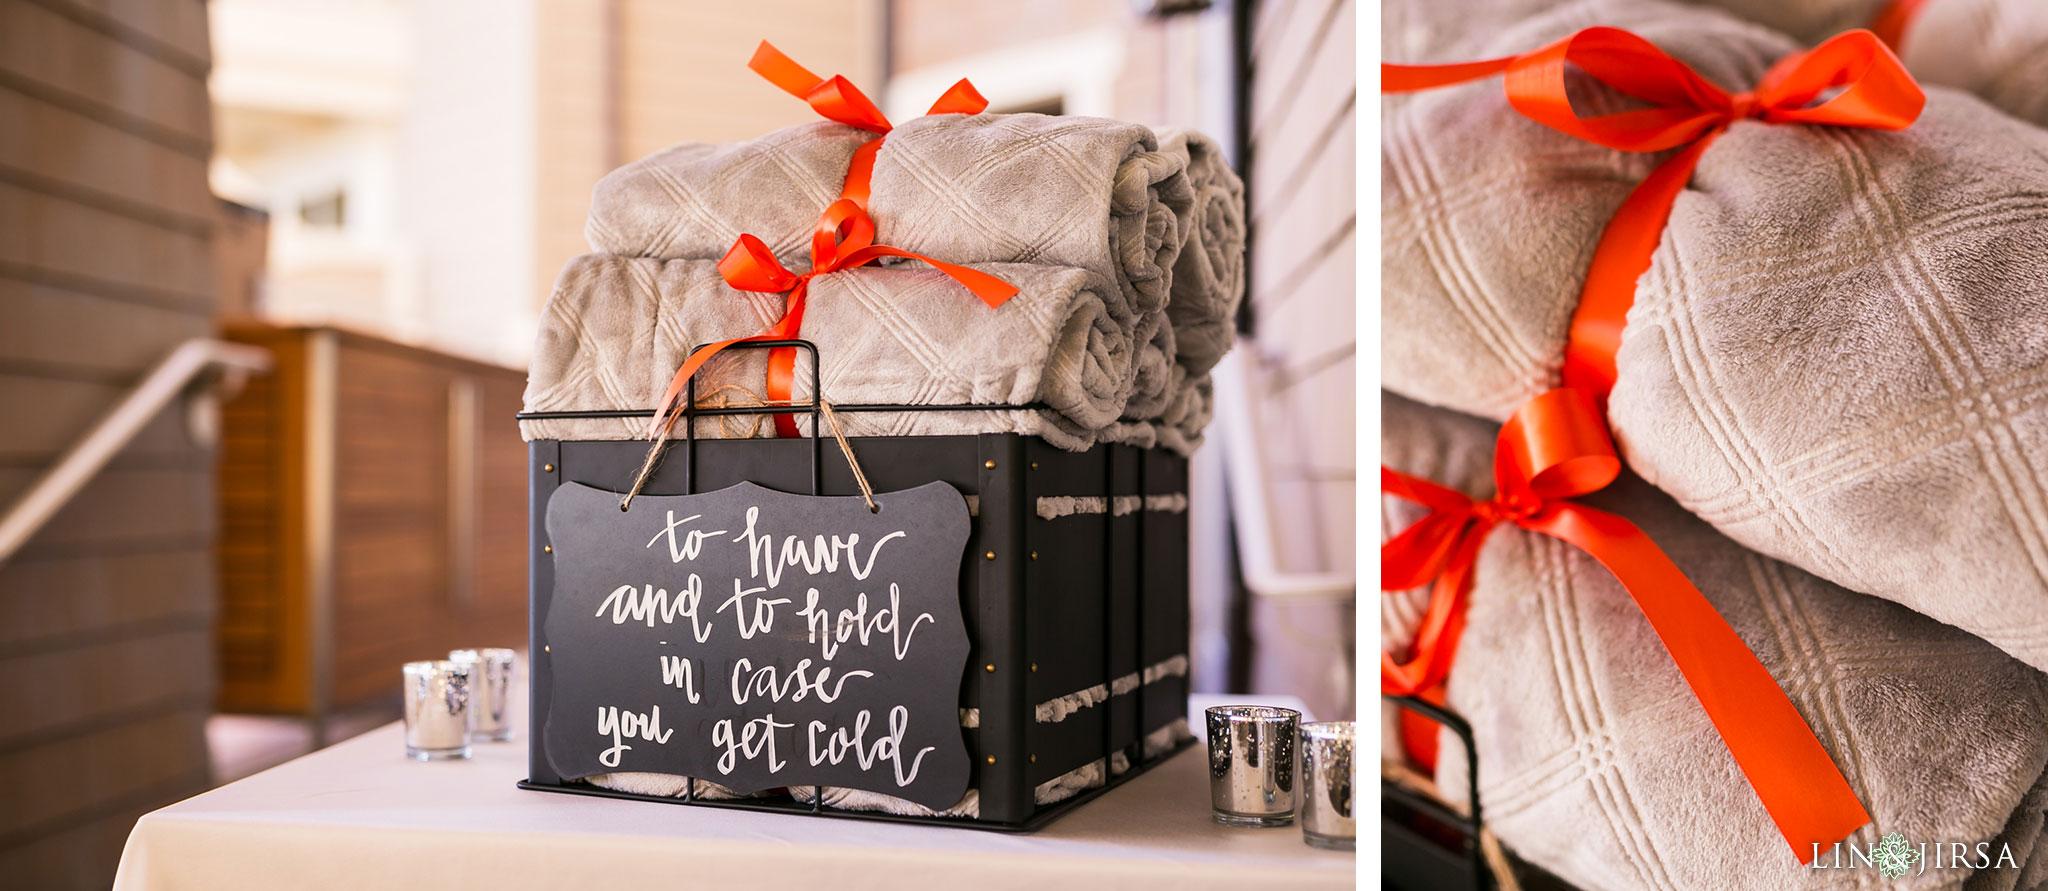 23 the loft orange county wedding photography